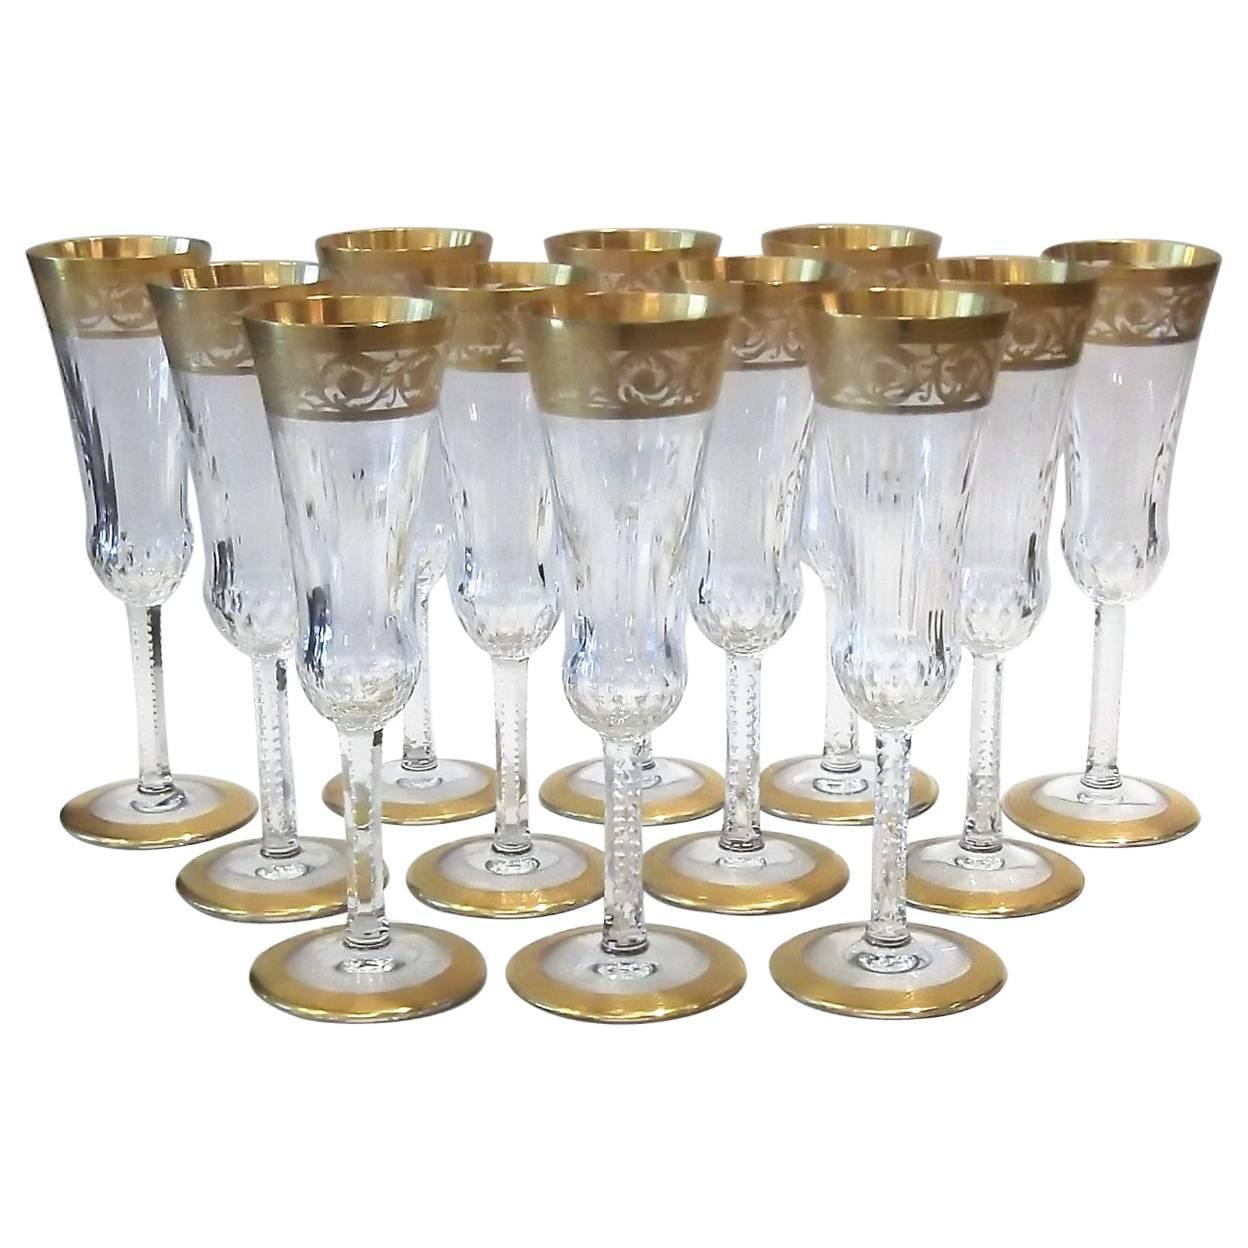 saint louis thistle pattern gold encrusted champagne flutes for sale at 1stdibs. Black Bedroom Furniture Sets. Home Design Ideas